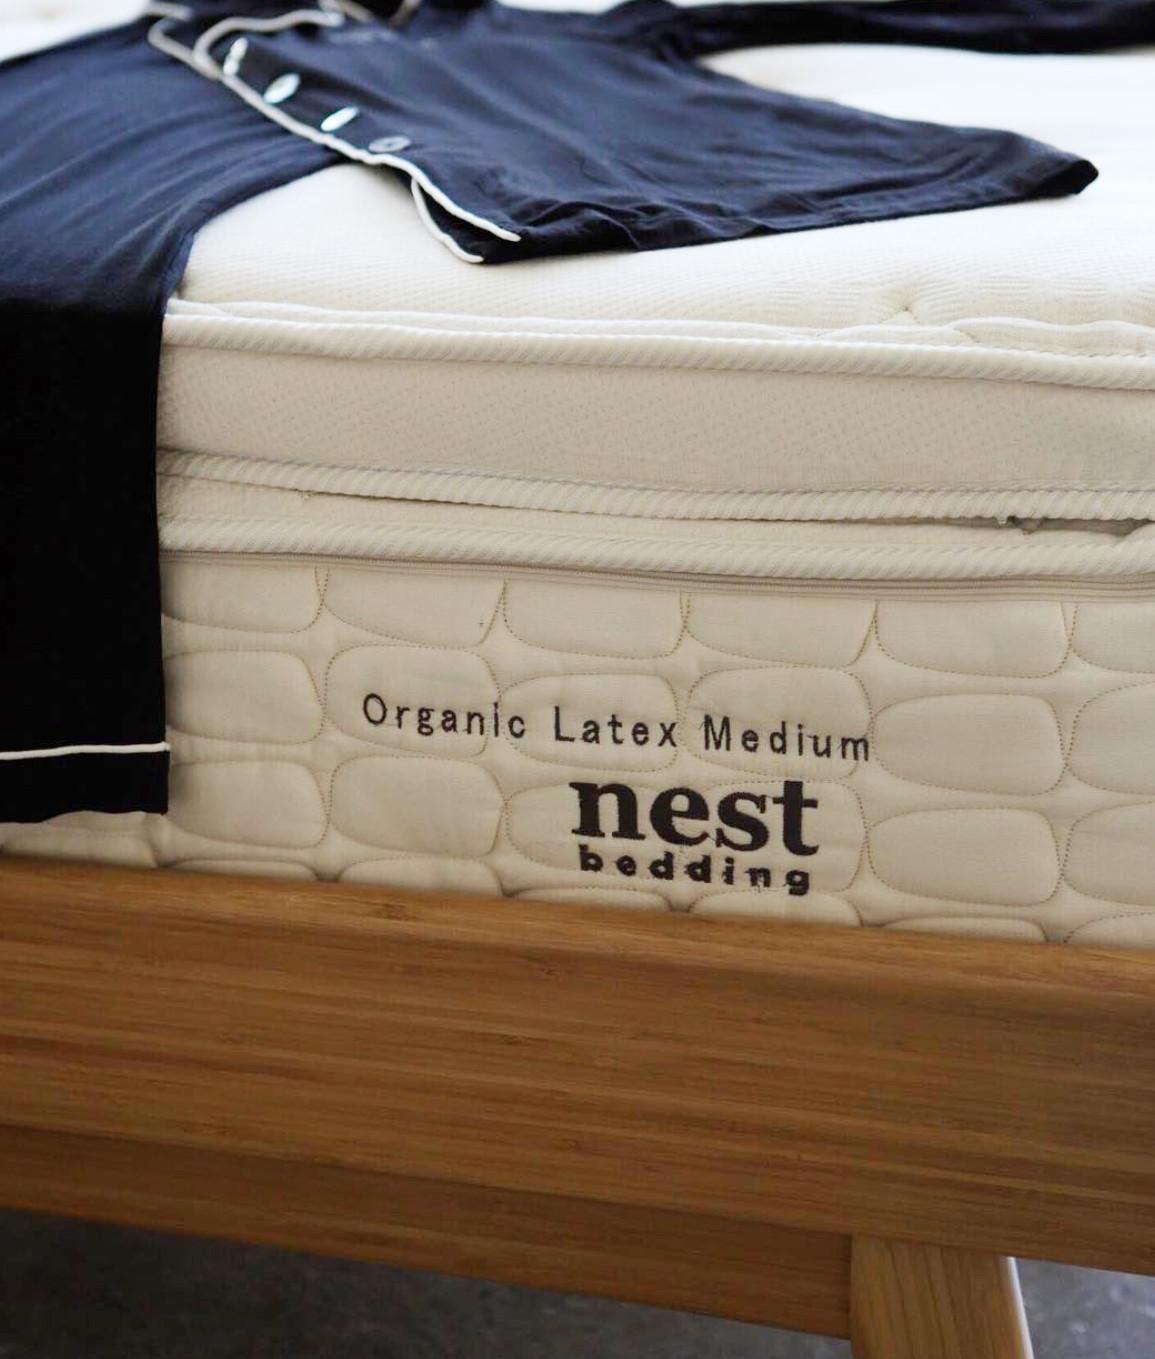 nest bedding organic latex